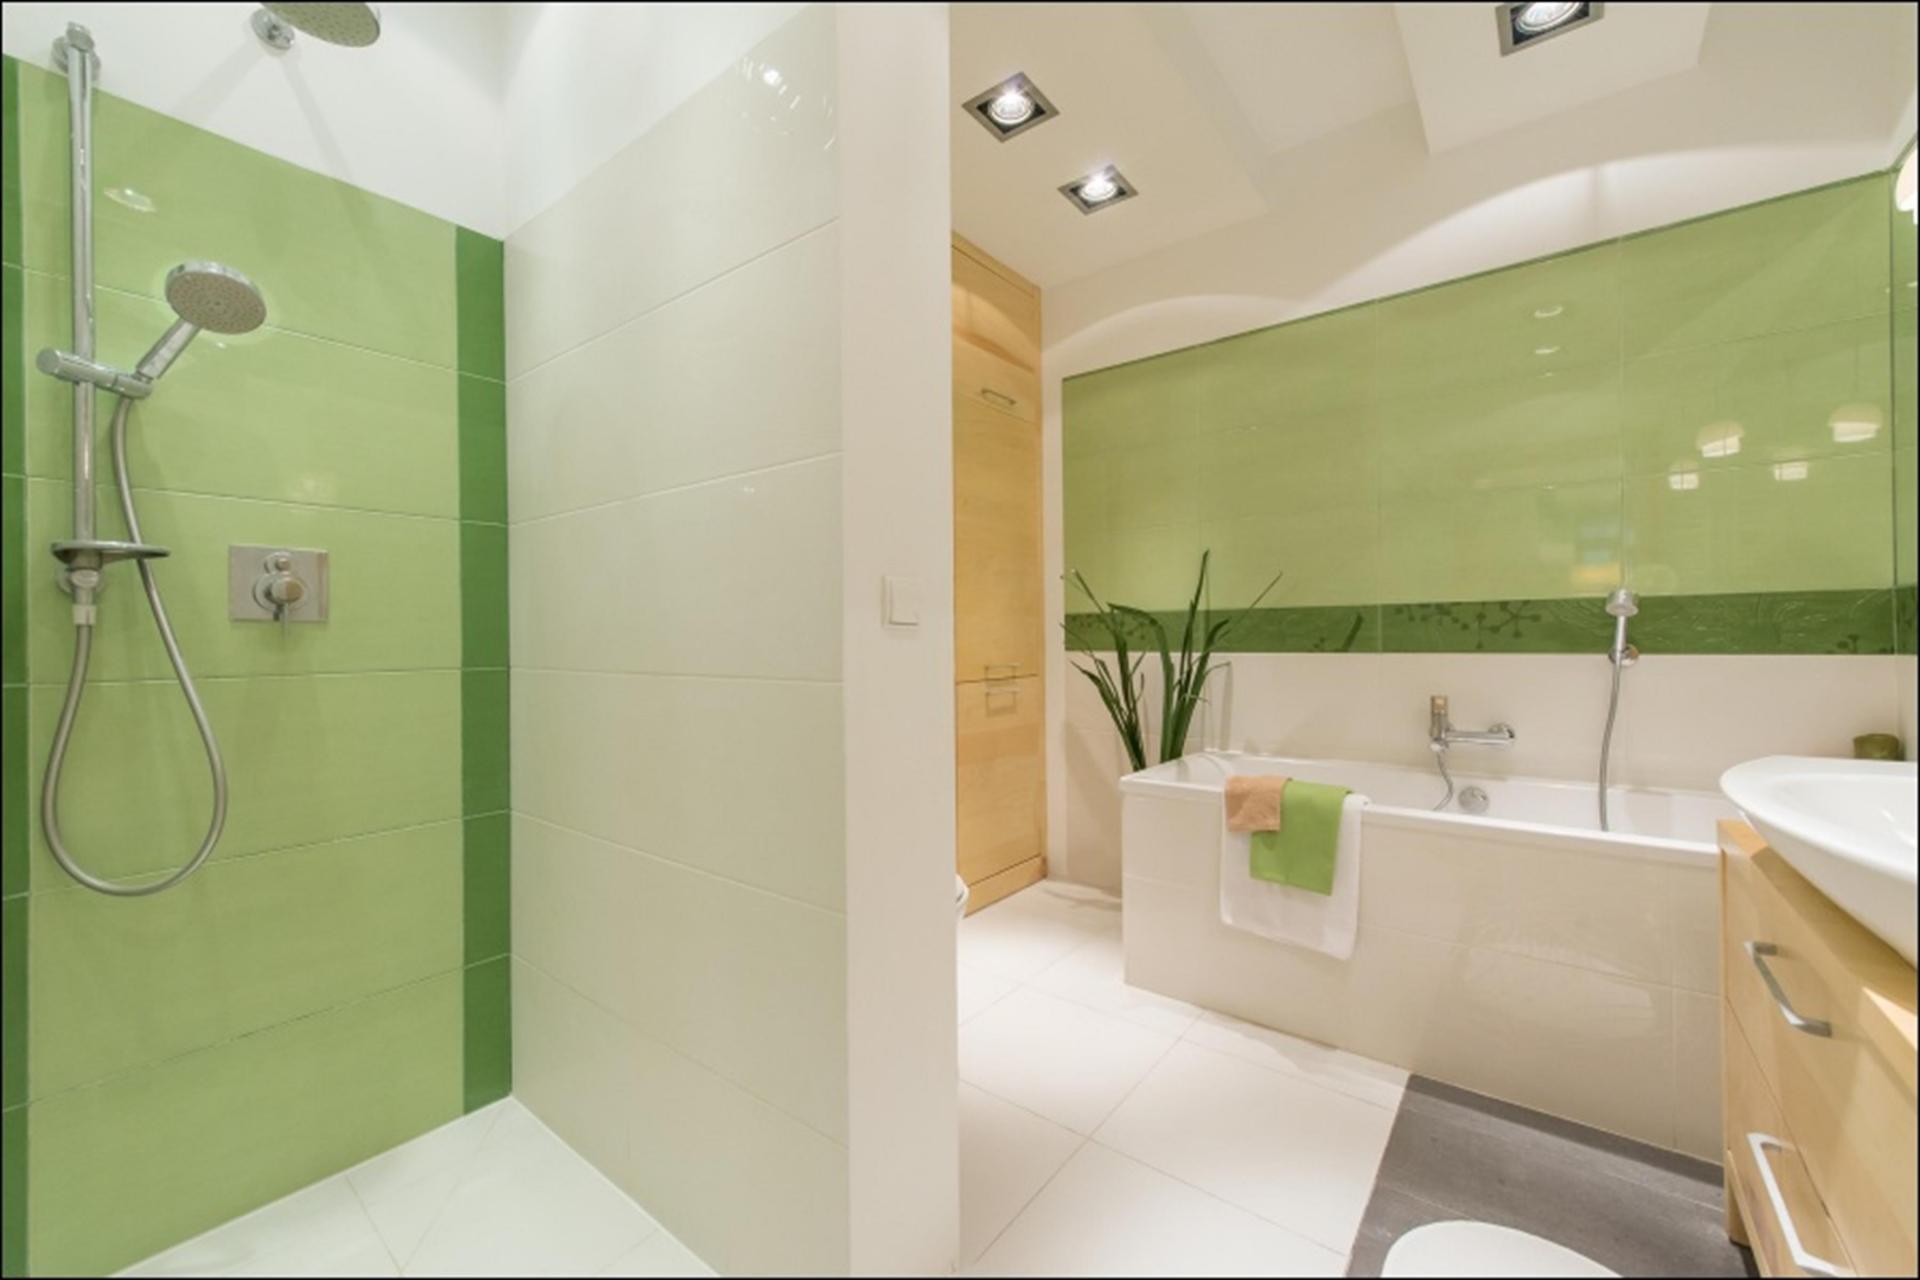 Bathroom at Wilanow 6 Apartments, Wilanów, Warsaw - Citybase Apartments